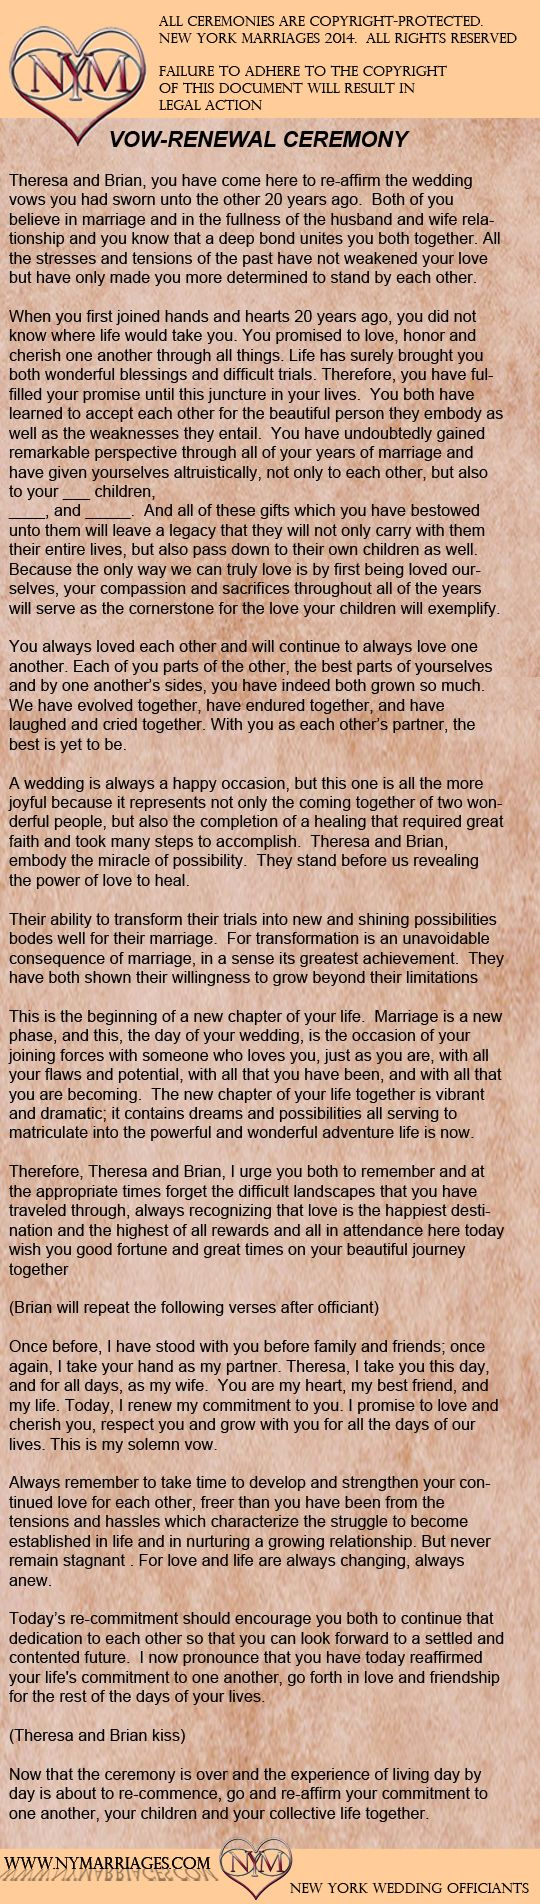 Wine box love letter ceremony sample wedding ceremonies new york wine box love letter ceremony sample wedding ceremonies new york wedding officiant long spiritdancerdesigns Choice Image